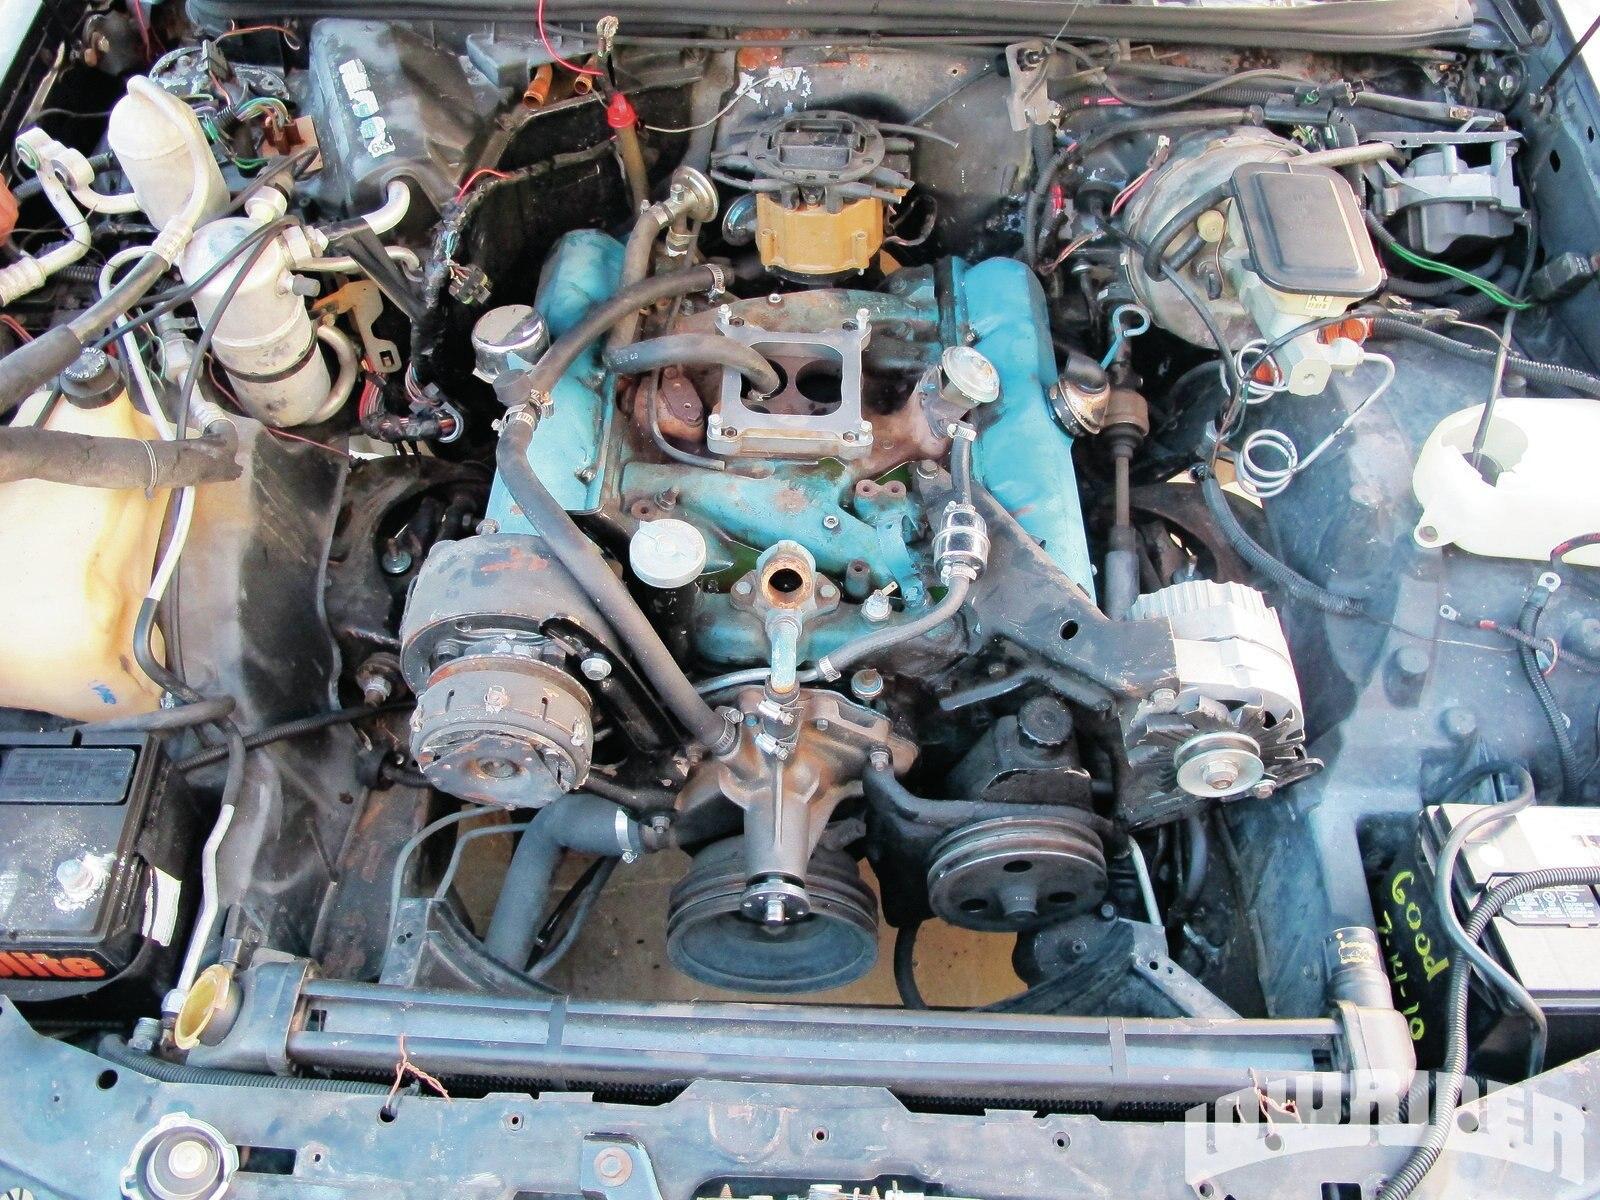 1984 Buick Regal Engine Swap